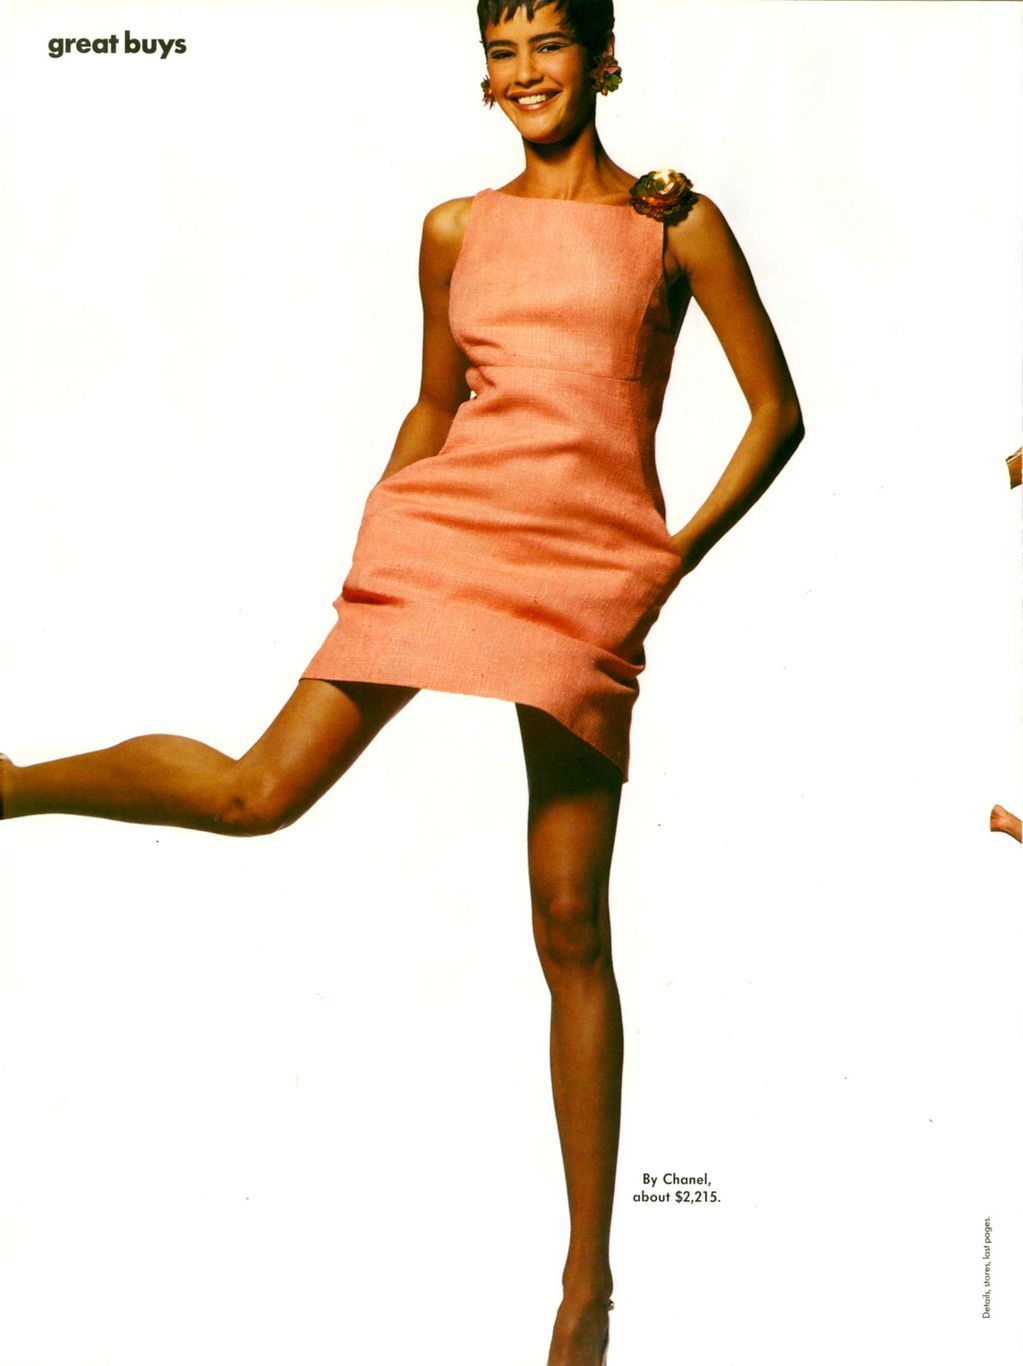 Vogue January 1991 | Great Buys - Dress Rehearsal 05.jpg